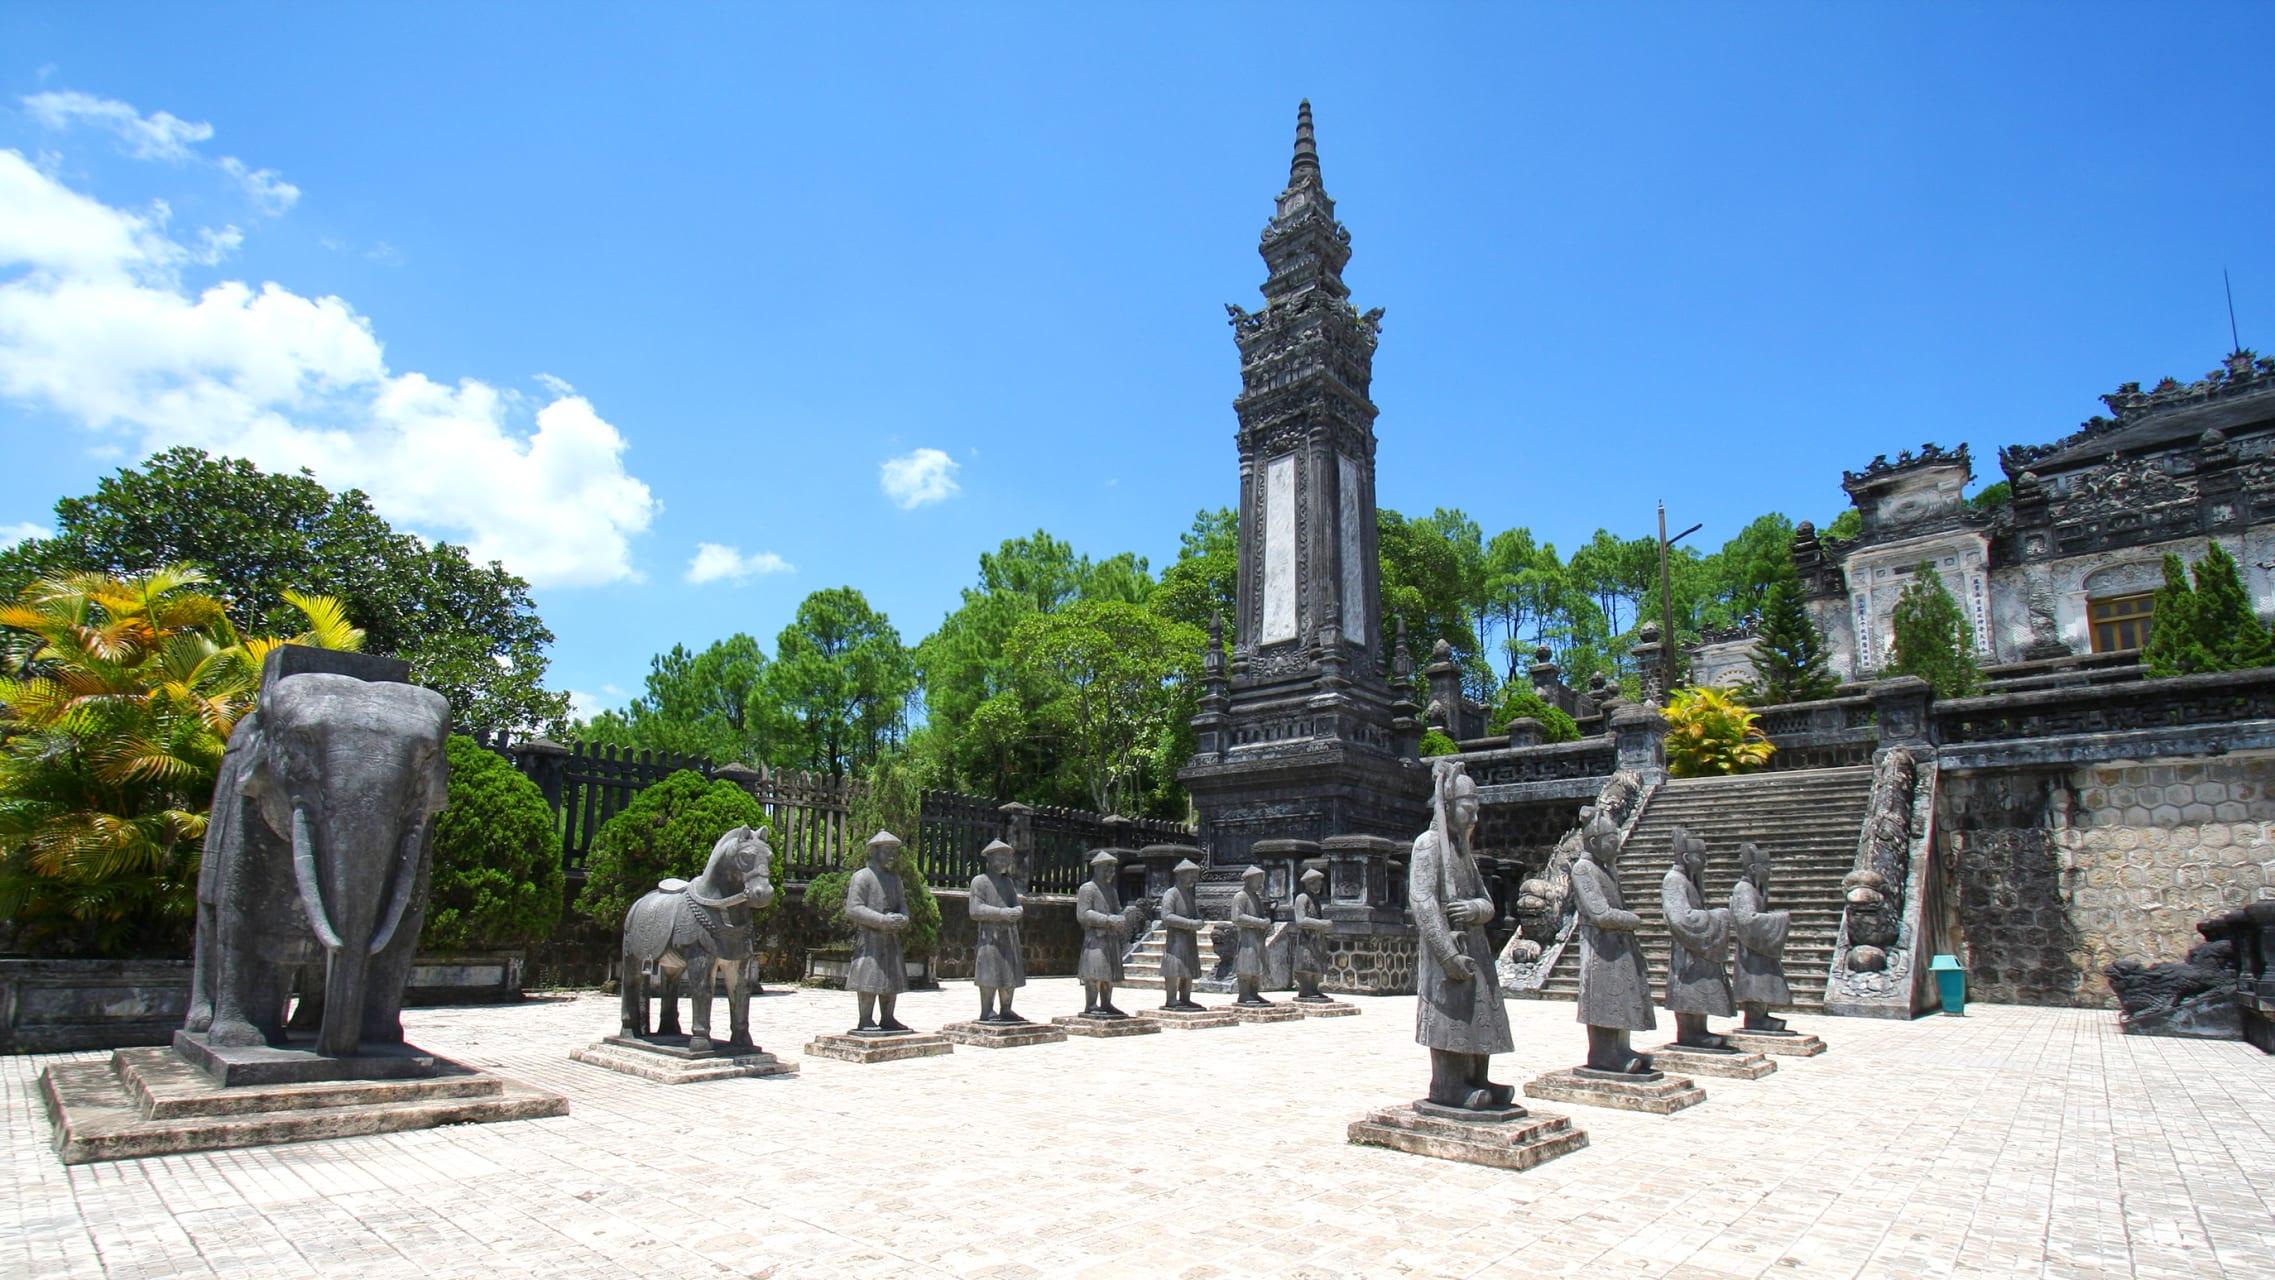 Hue - Discovering Huế - Final Day: Lavish Tomb of A Fallen Kingdom